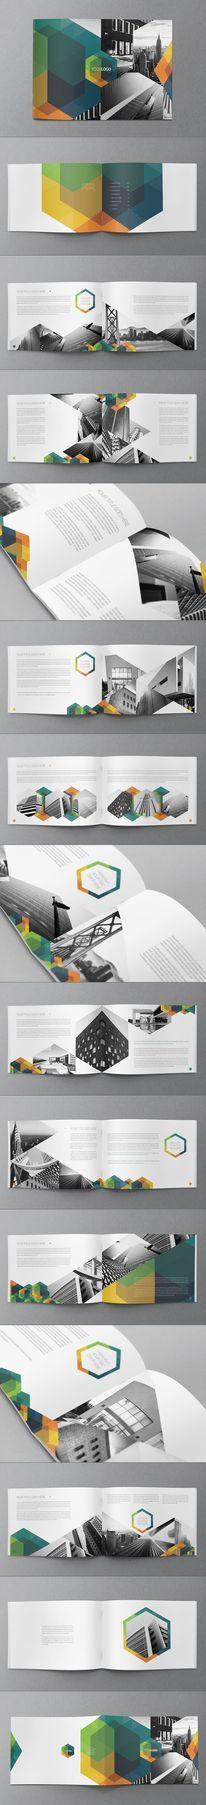 MagSpreads - Magazine Design and Editorial Inspiration: Australian Prevention Magazine — Designspiration